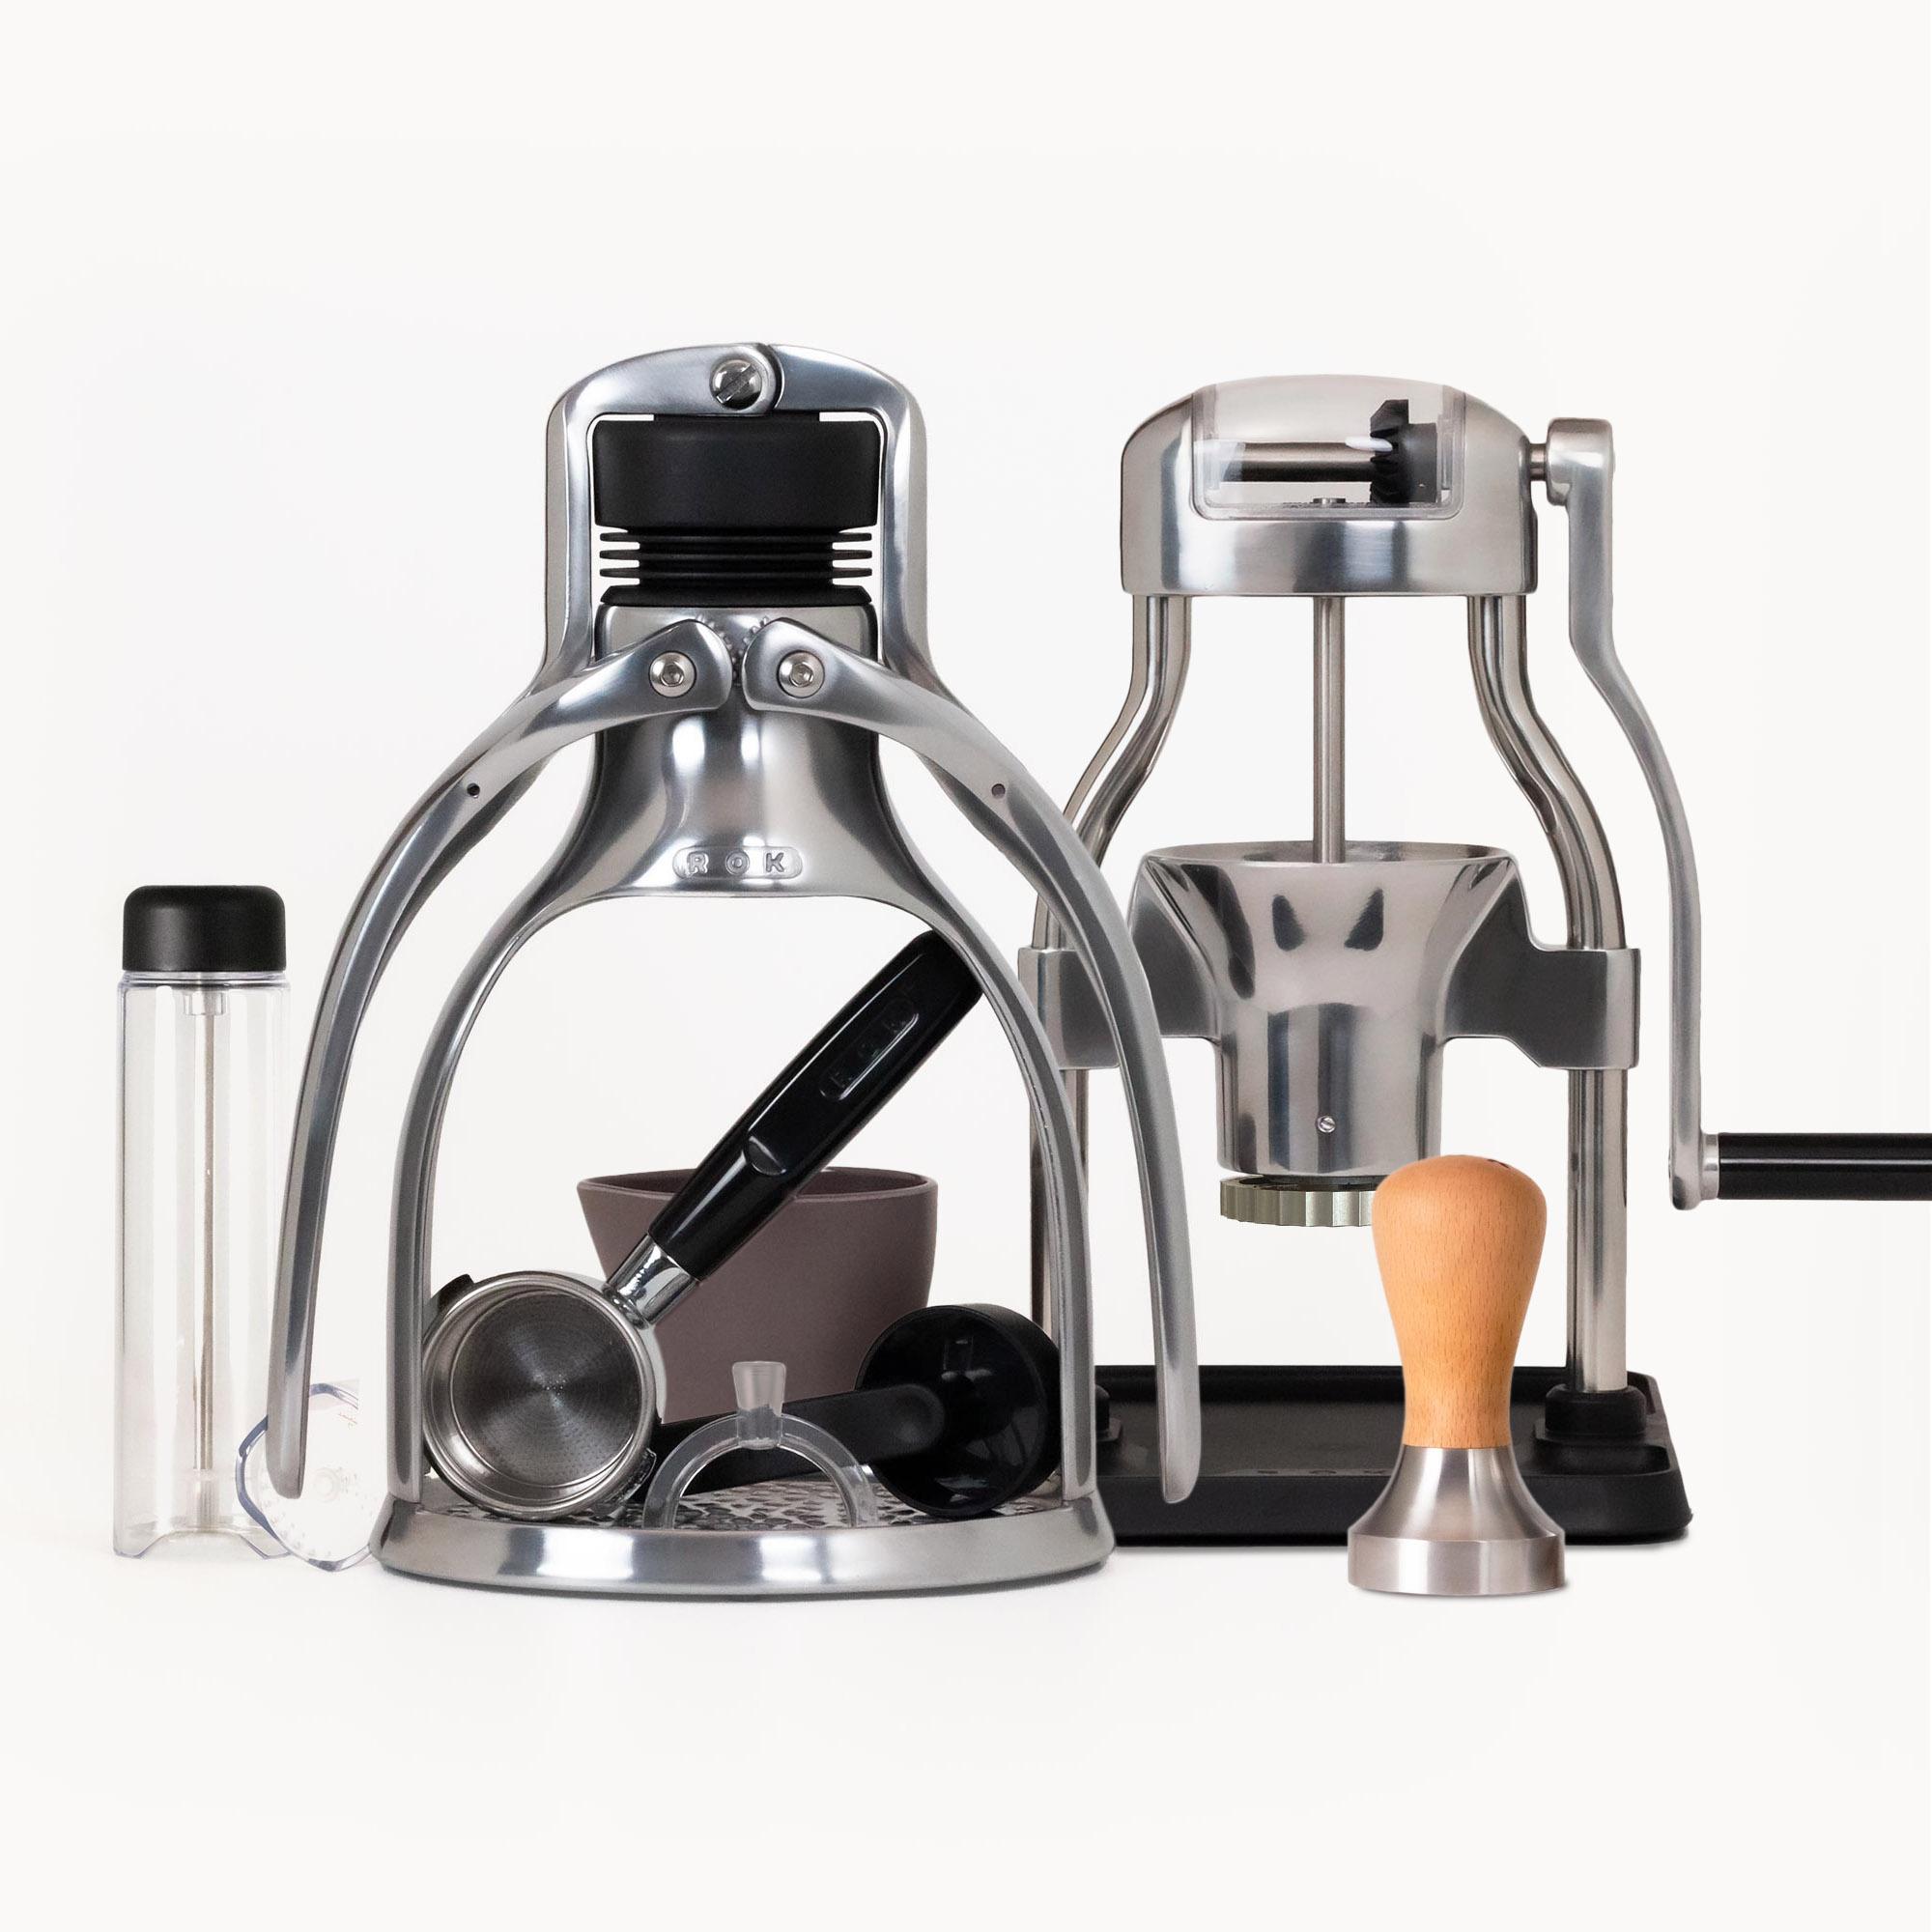 Espresso & Grinder Bundle